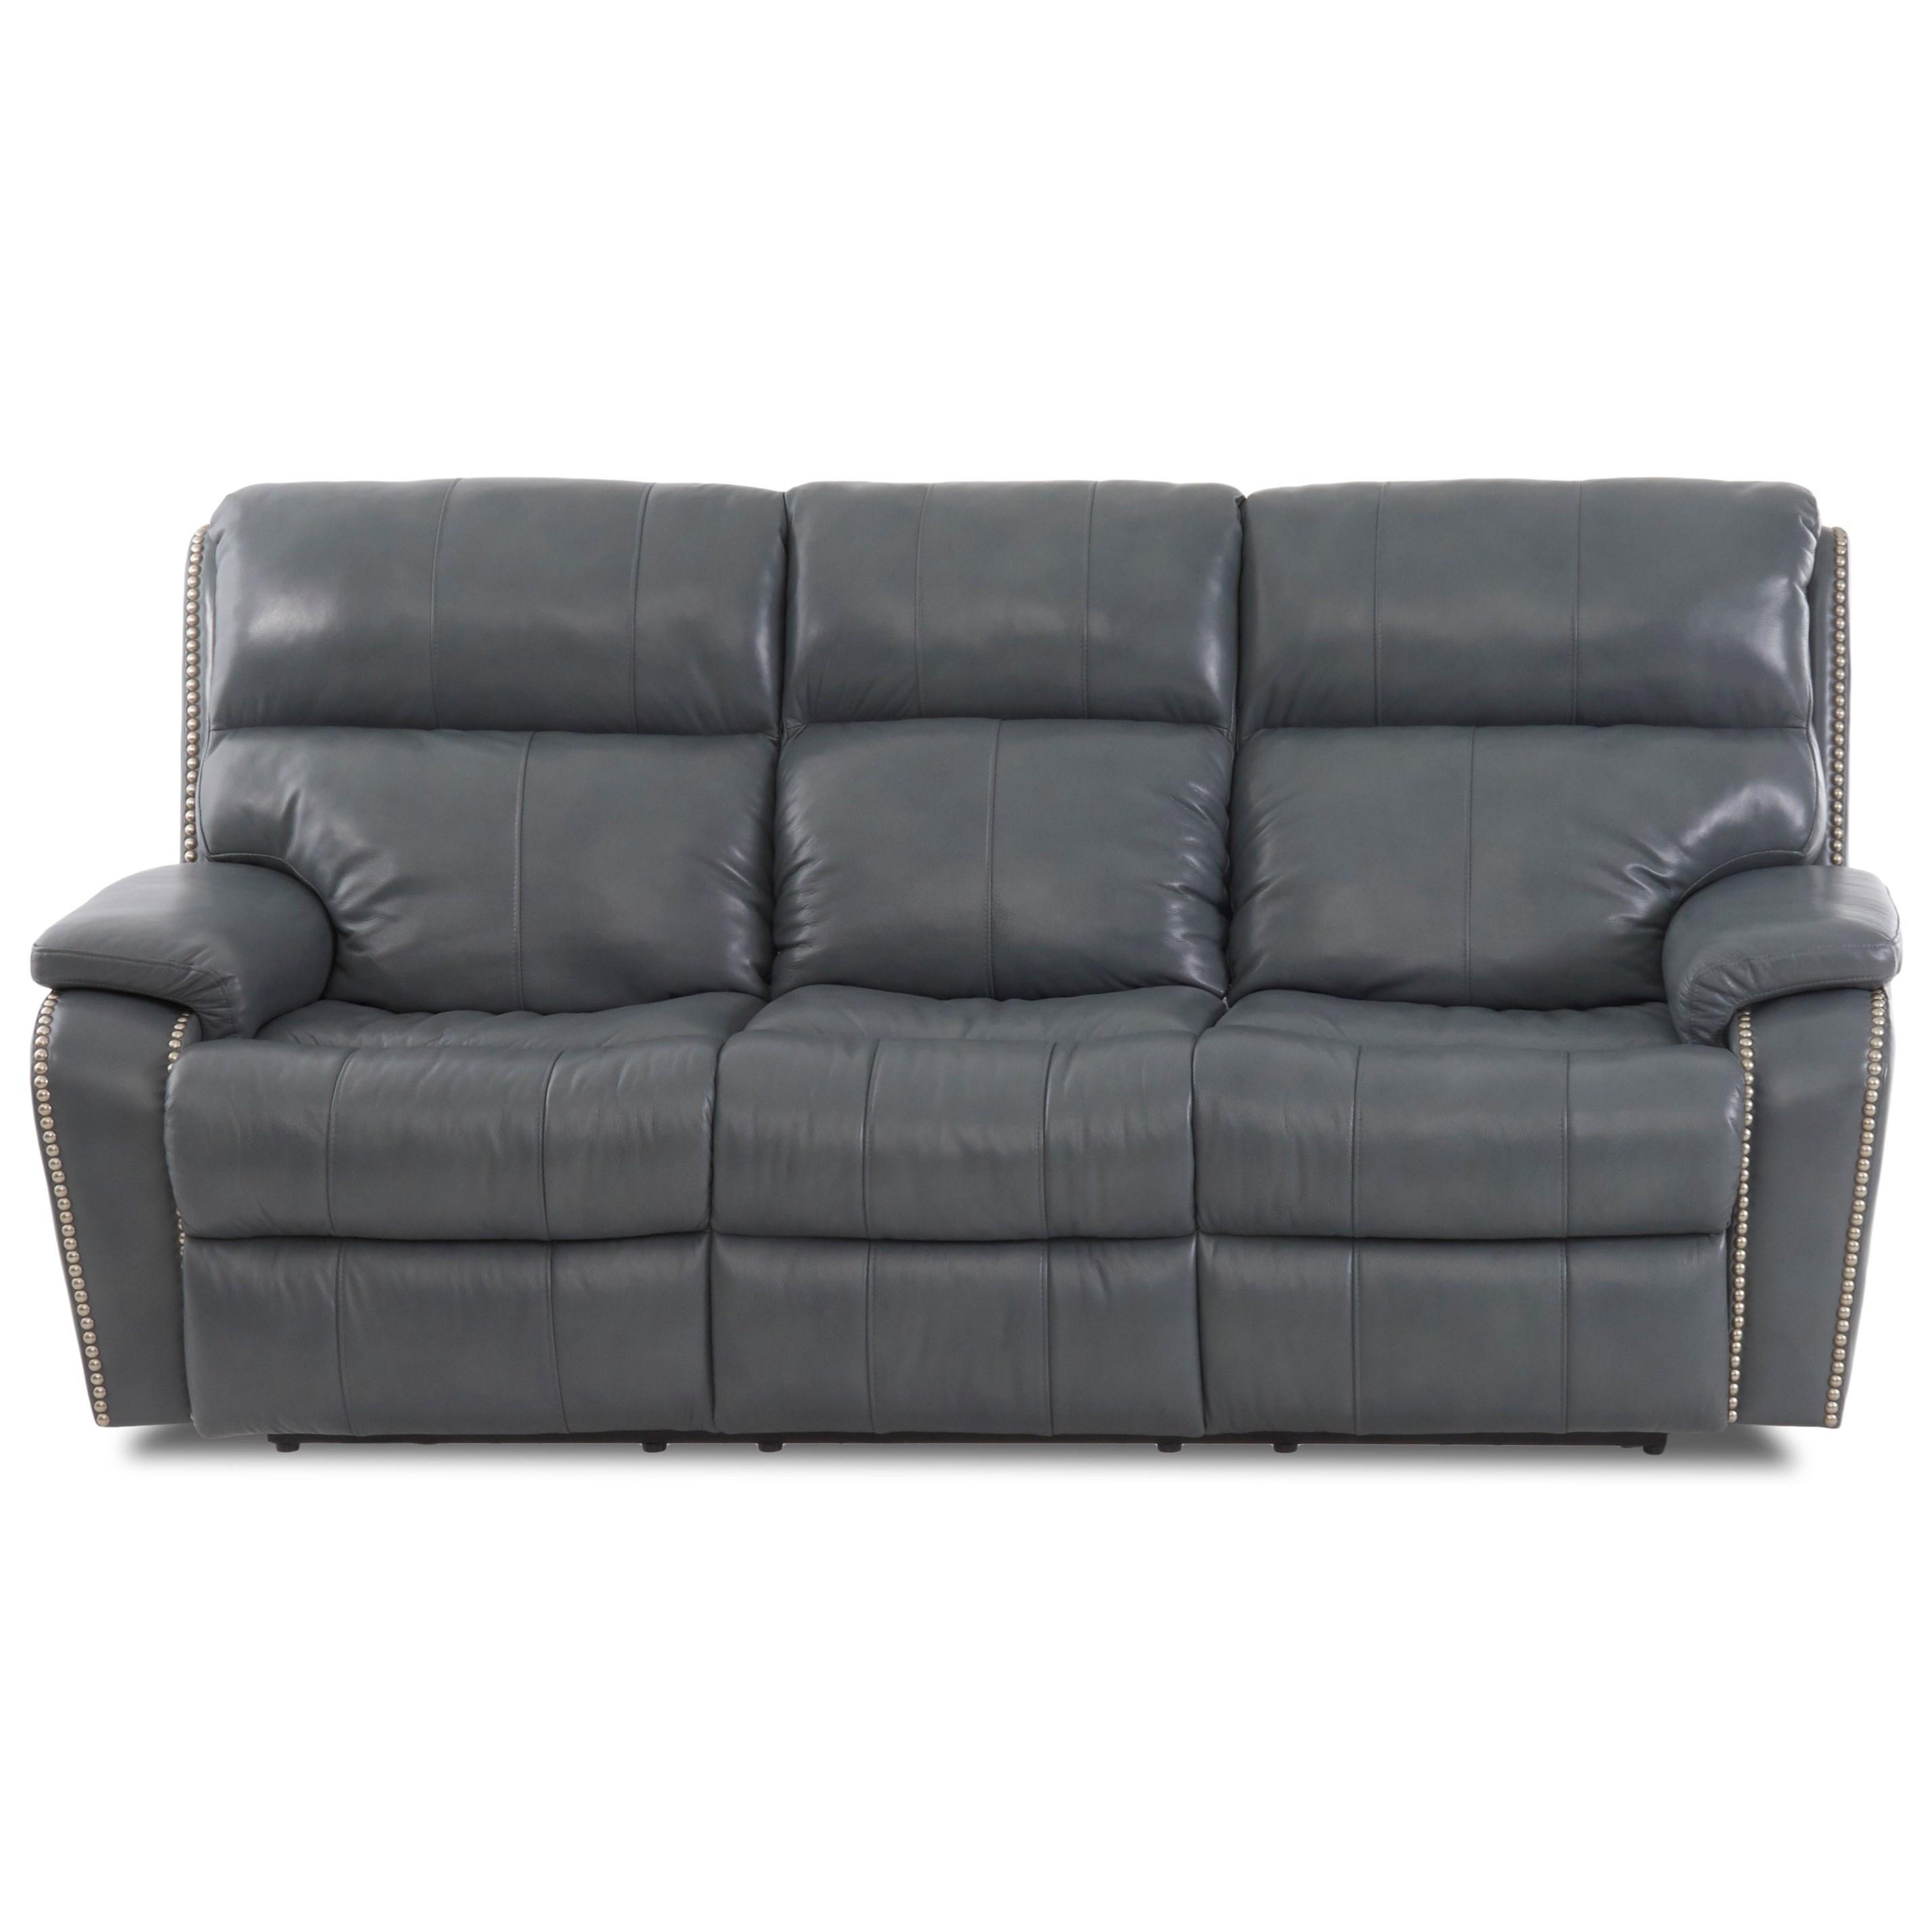 Reclining Sofa w/ Nails